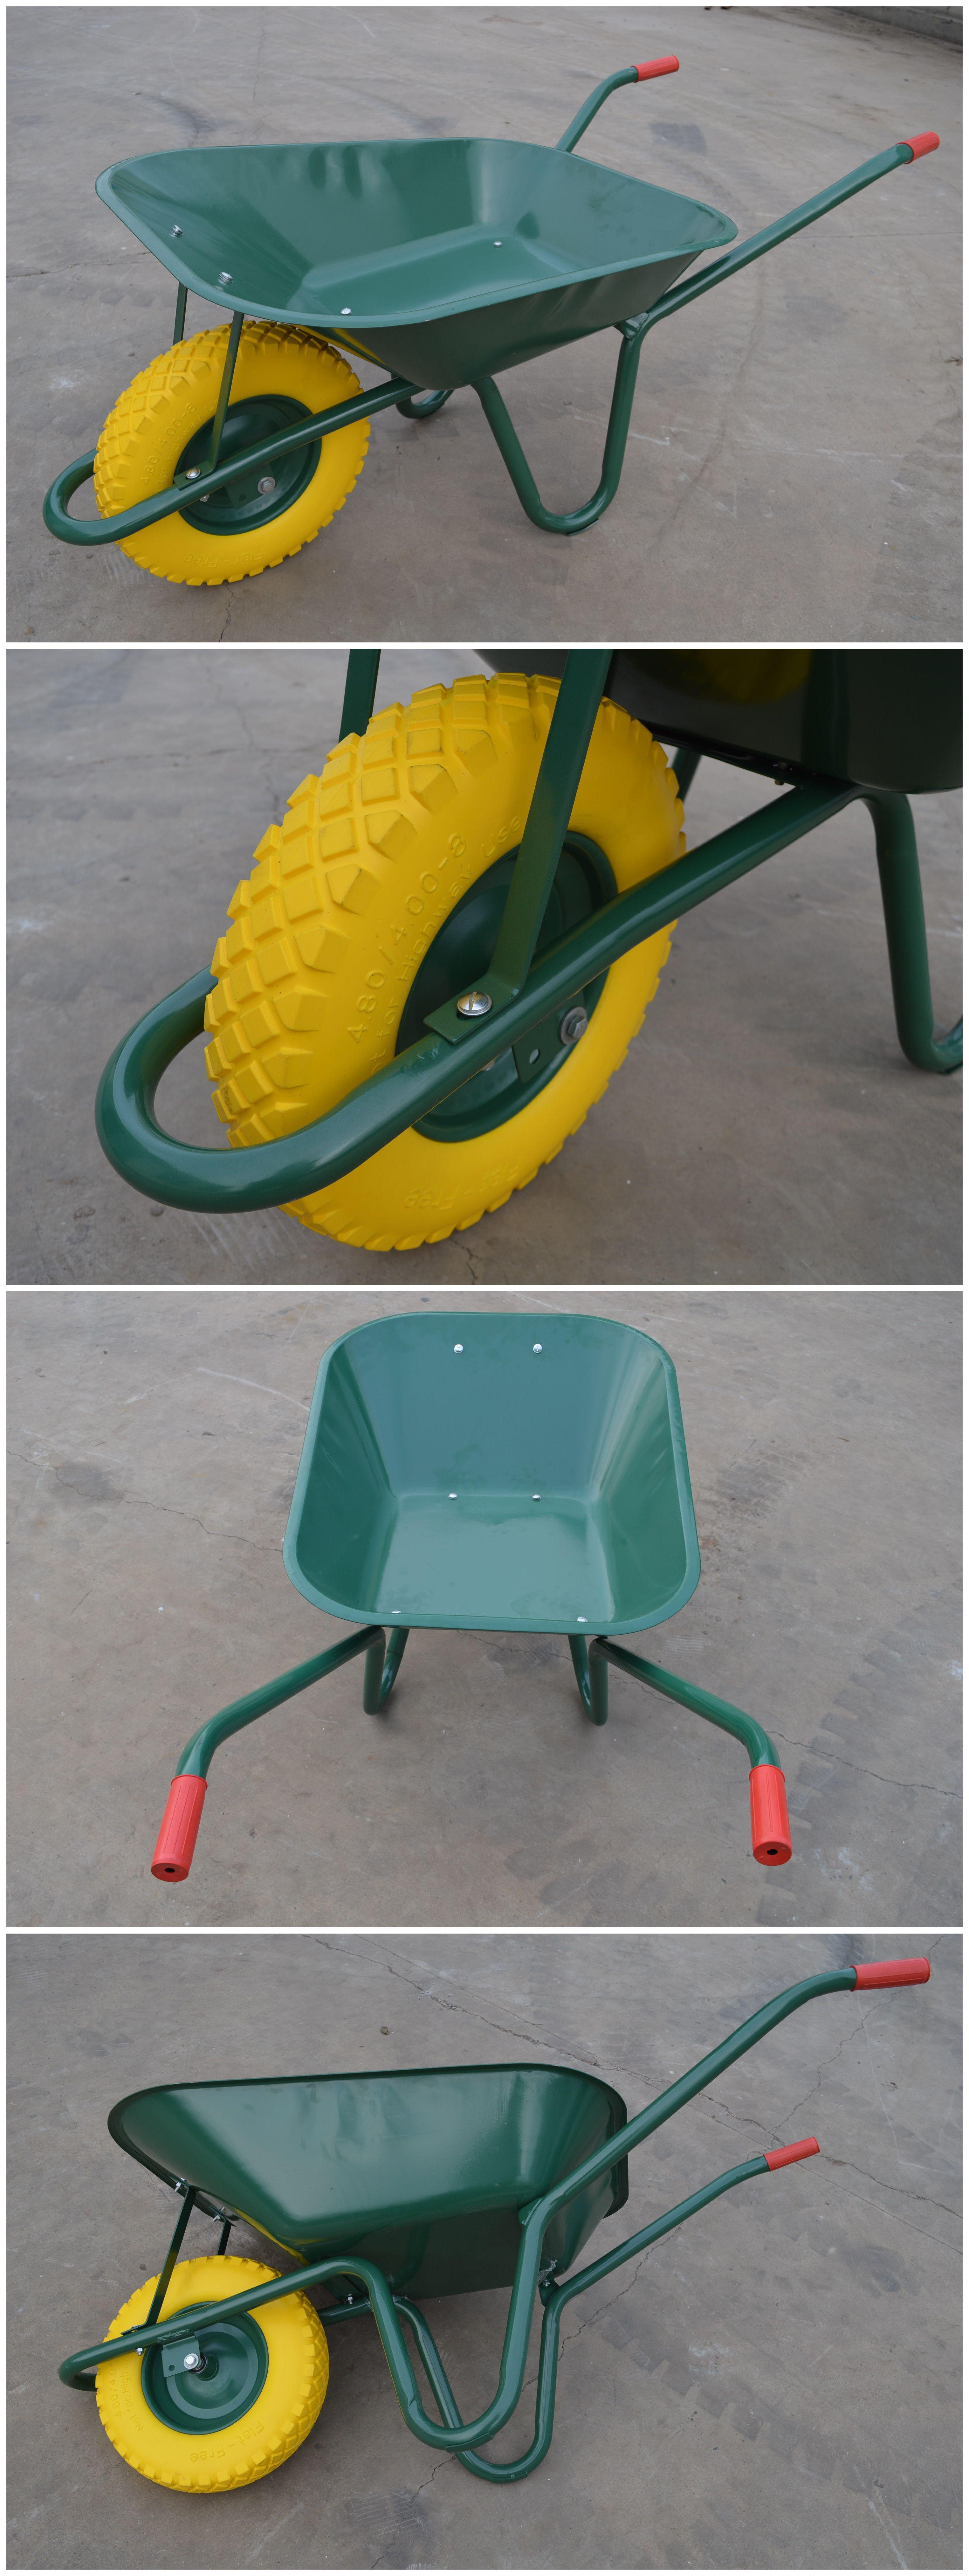 Pin By Alen Yang On Wheelbarrow Wheelbarrow Garden Hose Wheelbarrow Wheels